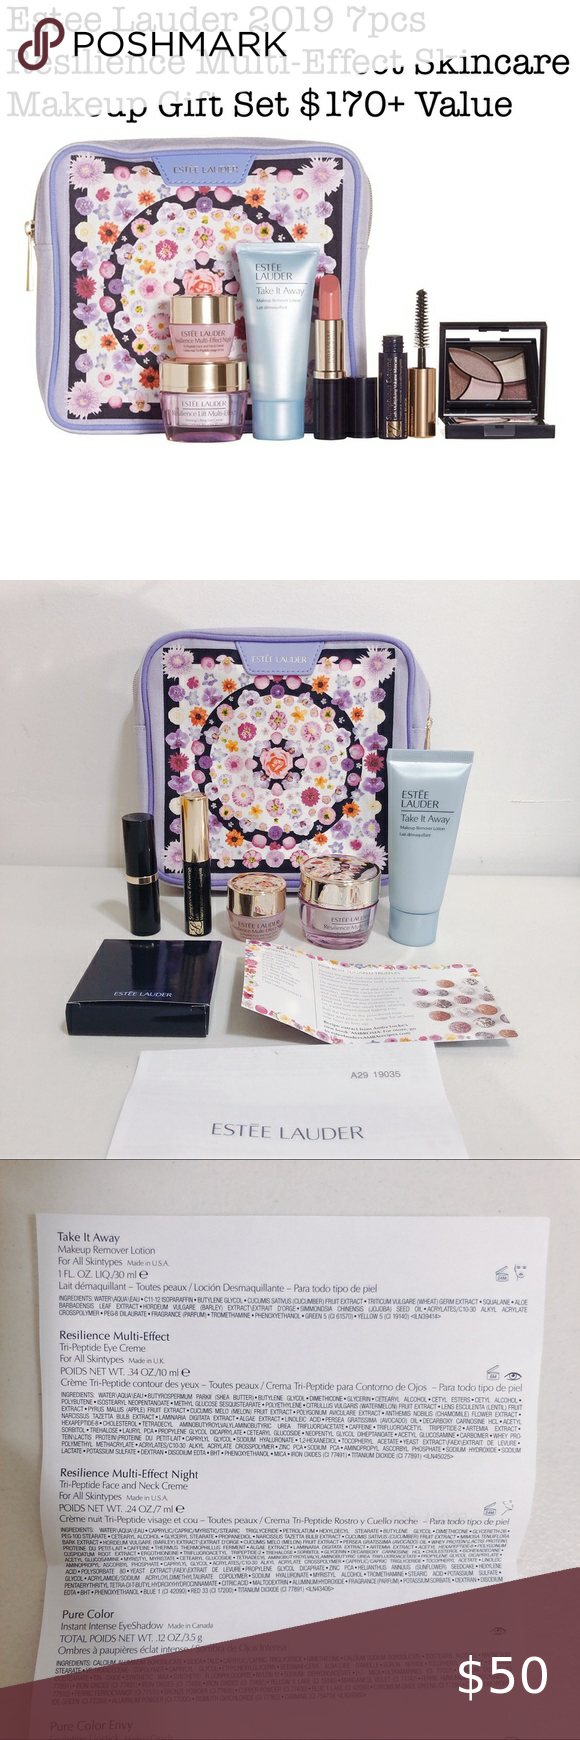 Estée Lauder Sumptuous Extreme Mascara Makeup Gift Set in